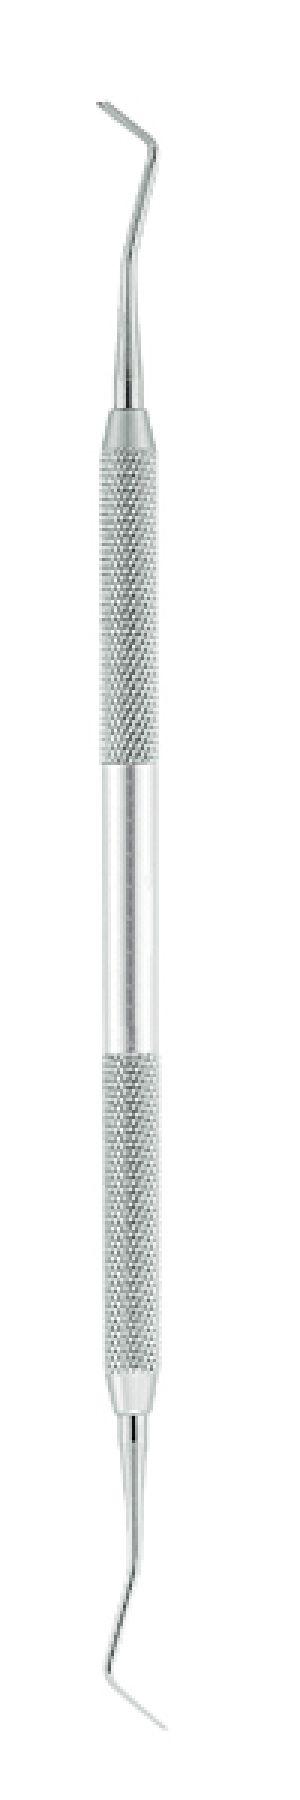 MI-73-105 Dental Wax & Modelling Carver